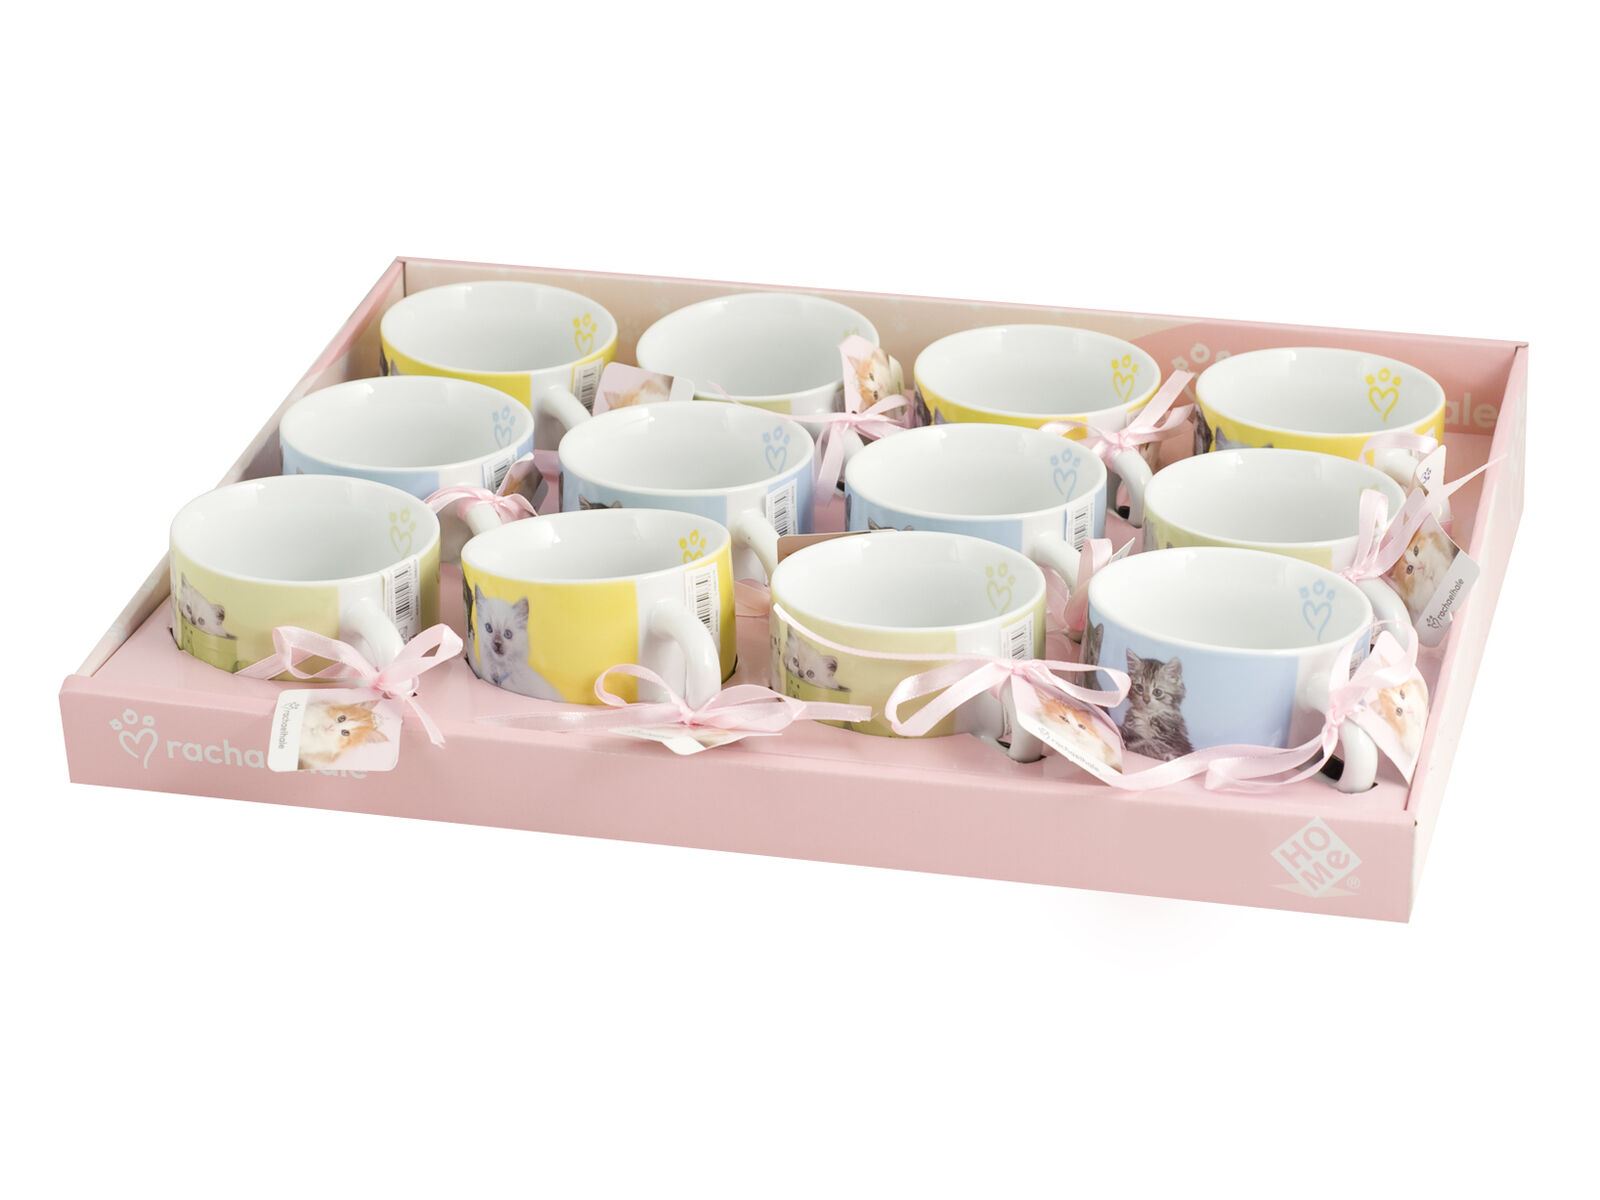 HOME Set 12 Tazze Tè Porcellana Cats Senza Piatti Cc260